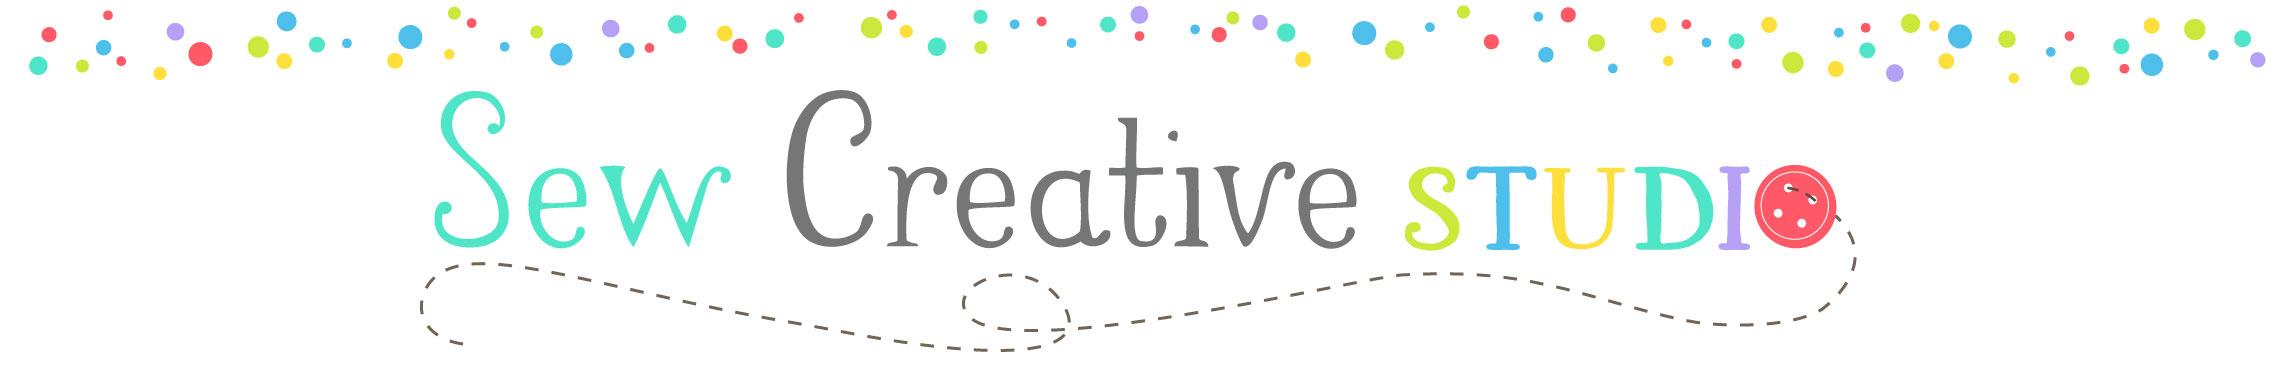 Sew Creative Studio